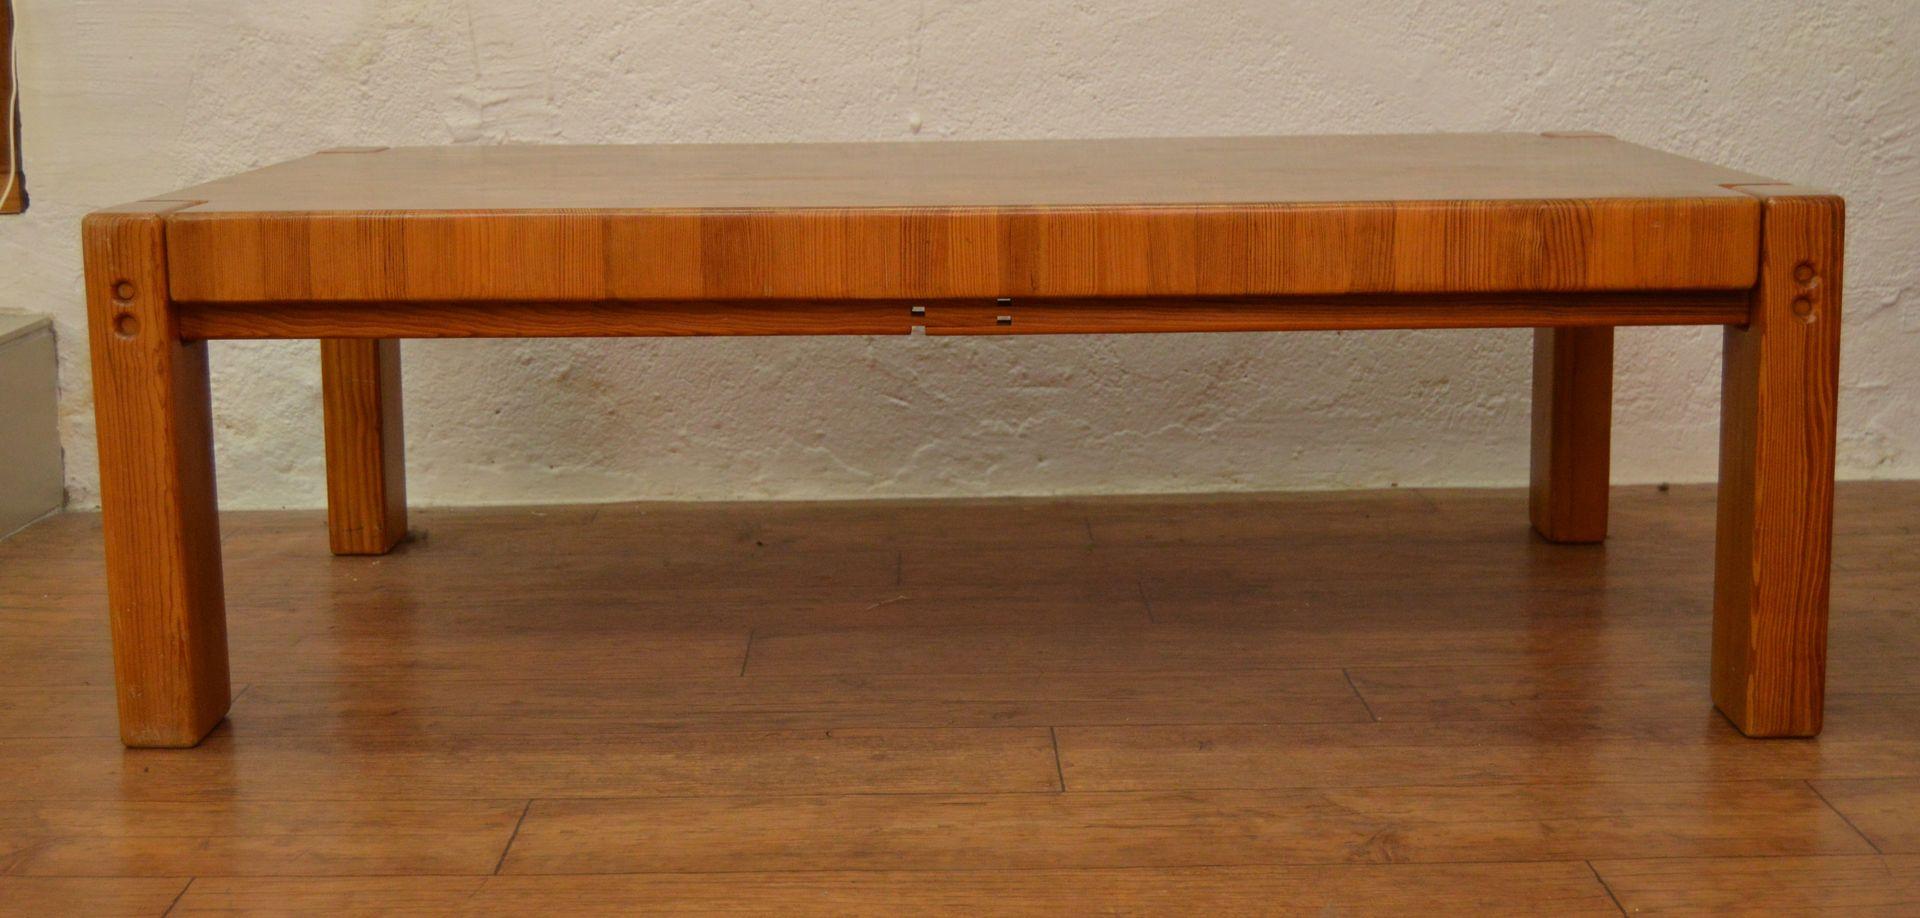 Danish Pine Coffee Table 1970s For Sale At Pamono